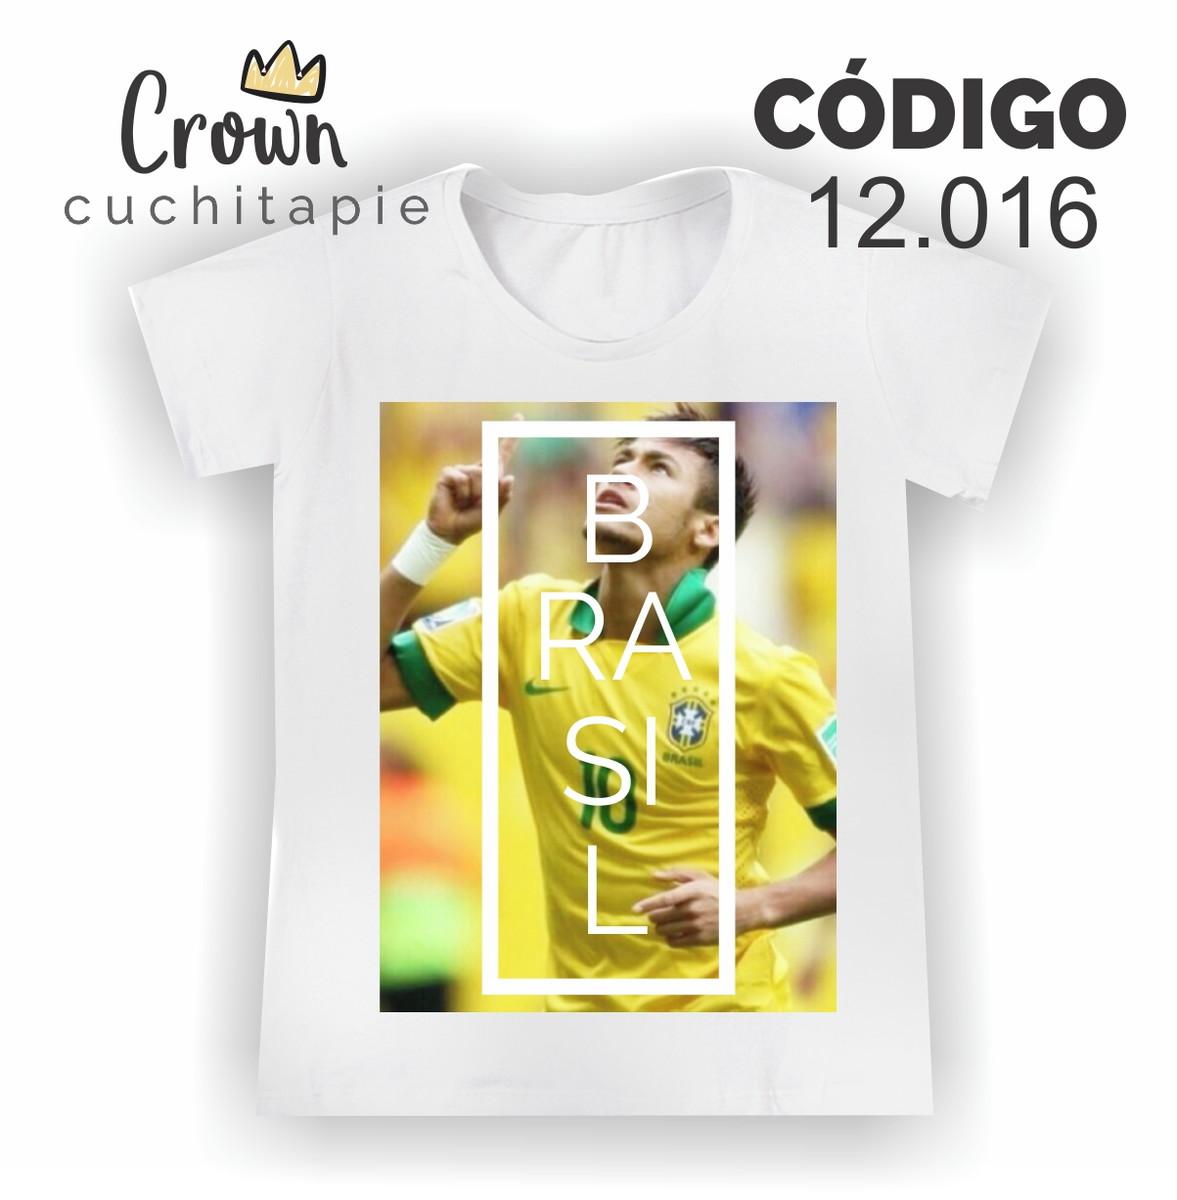 a3d6e80474 Baby look - Copa - Neymar Jr. Brasil no Elo7